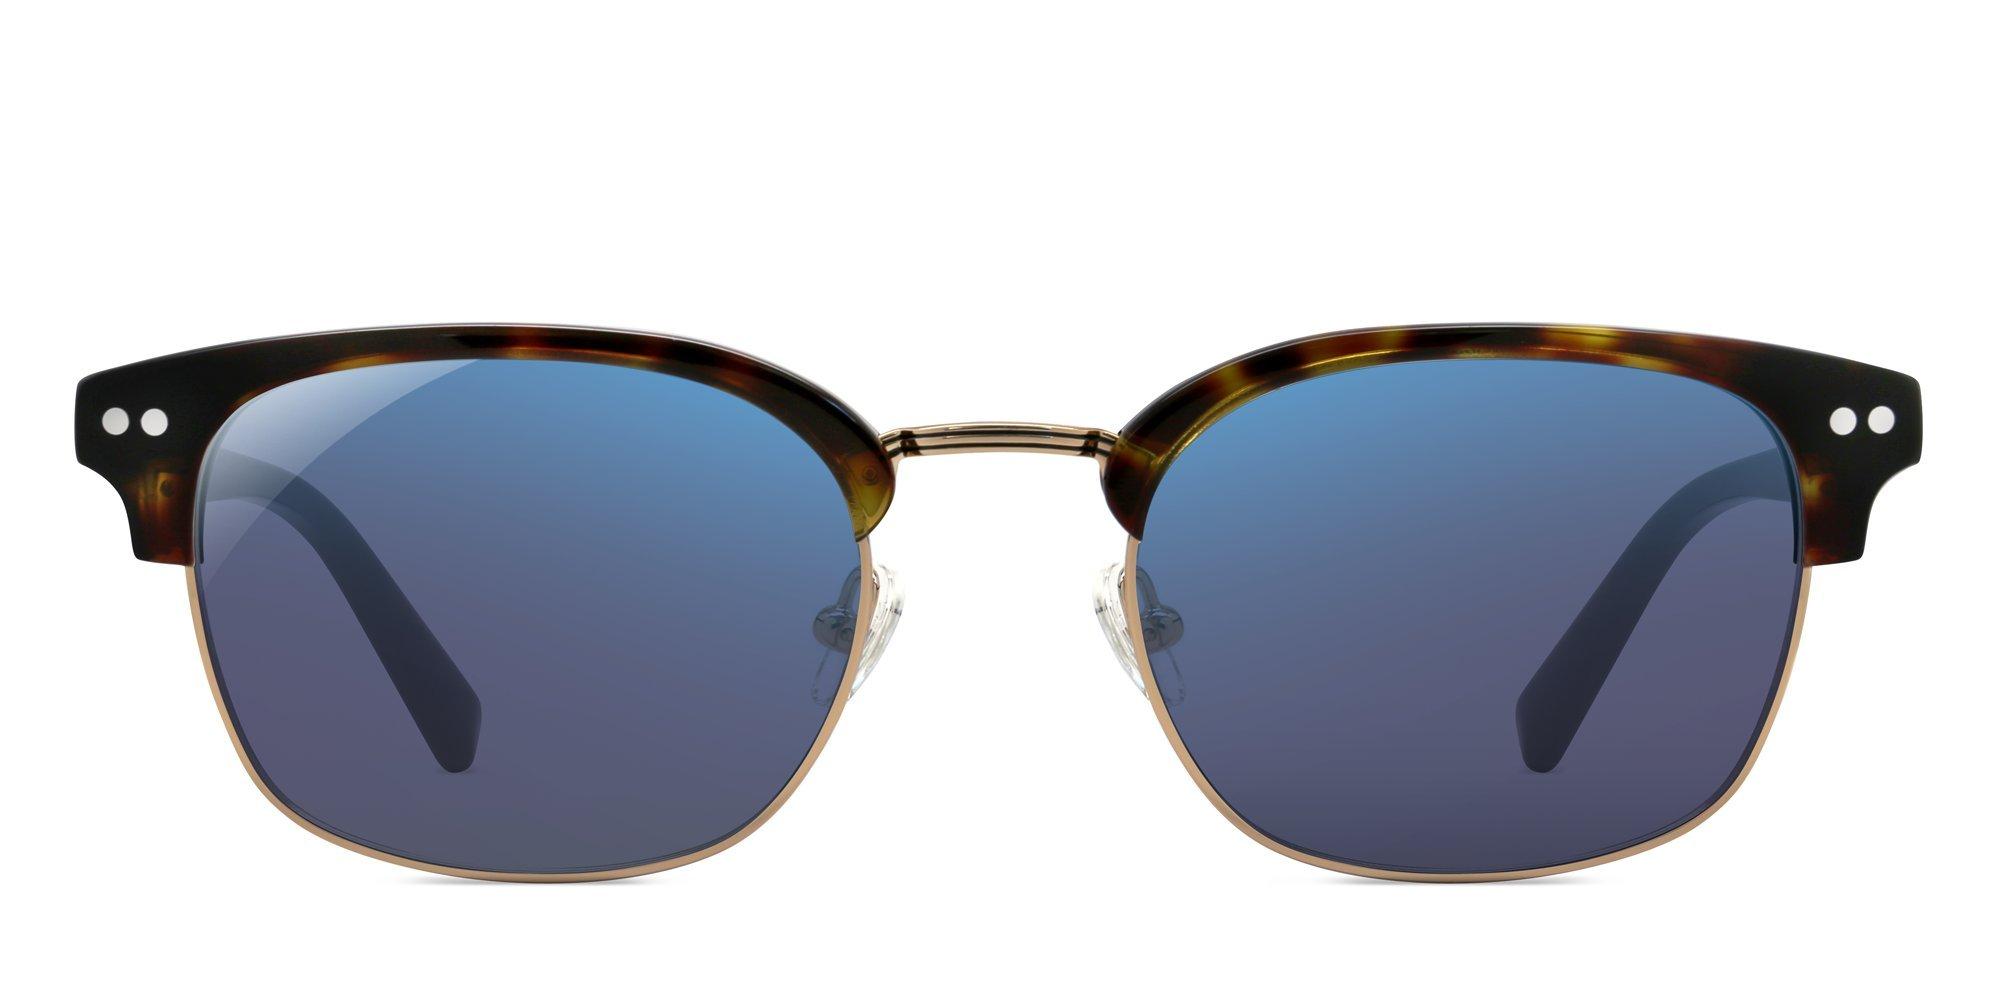 Enchroma Derby - Glasses for the Color Blind (Tortoise)